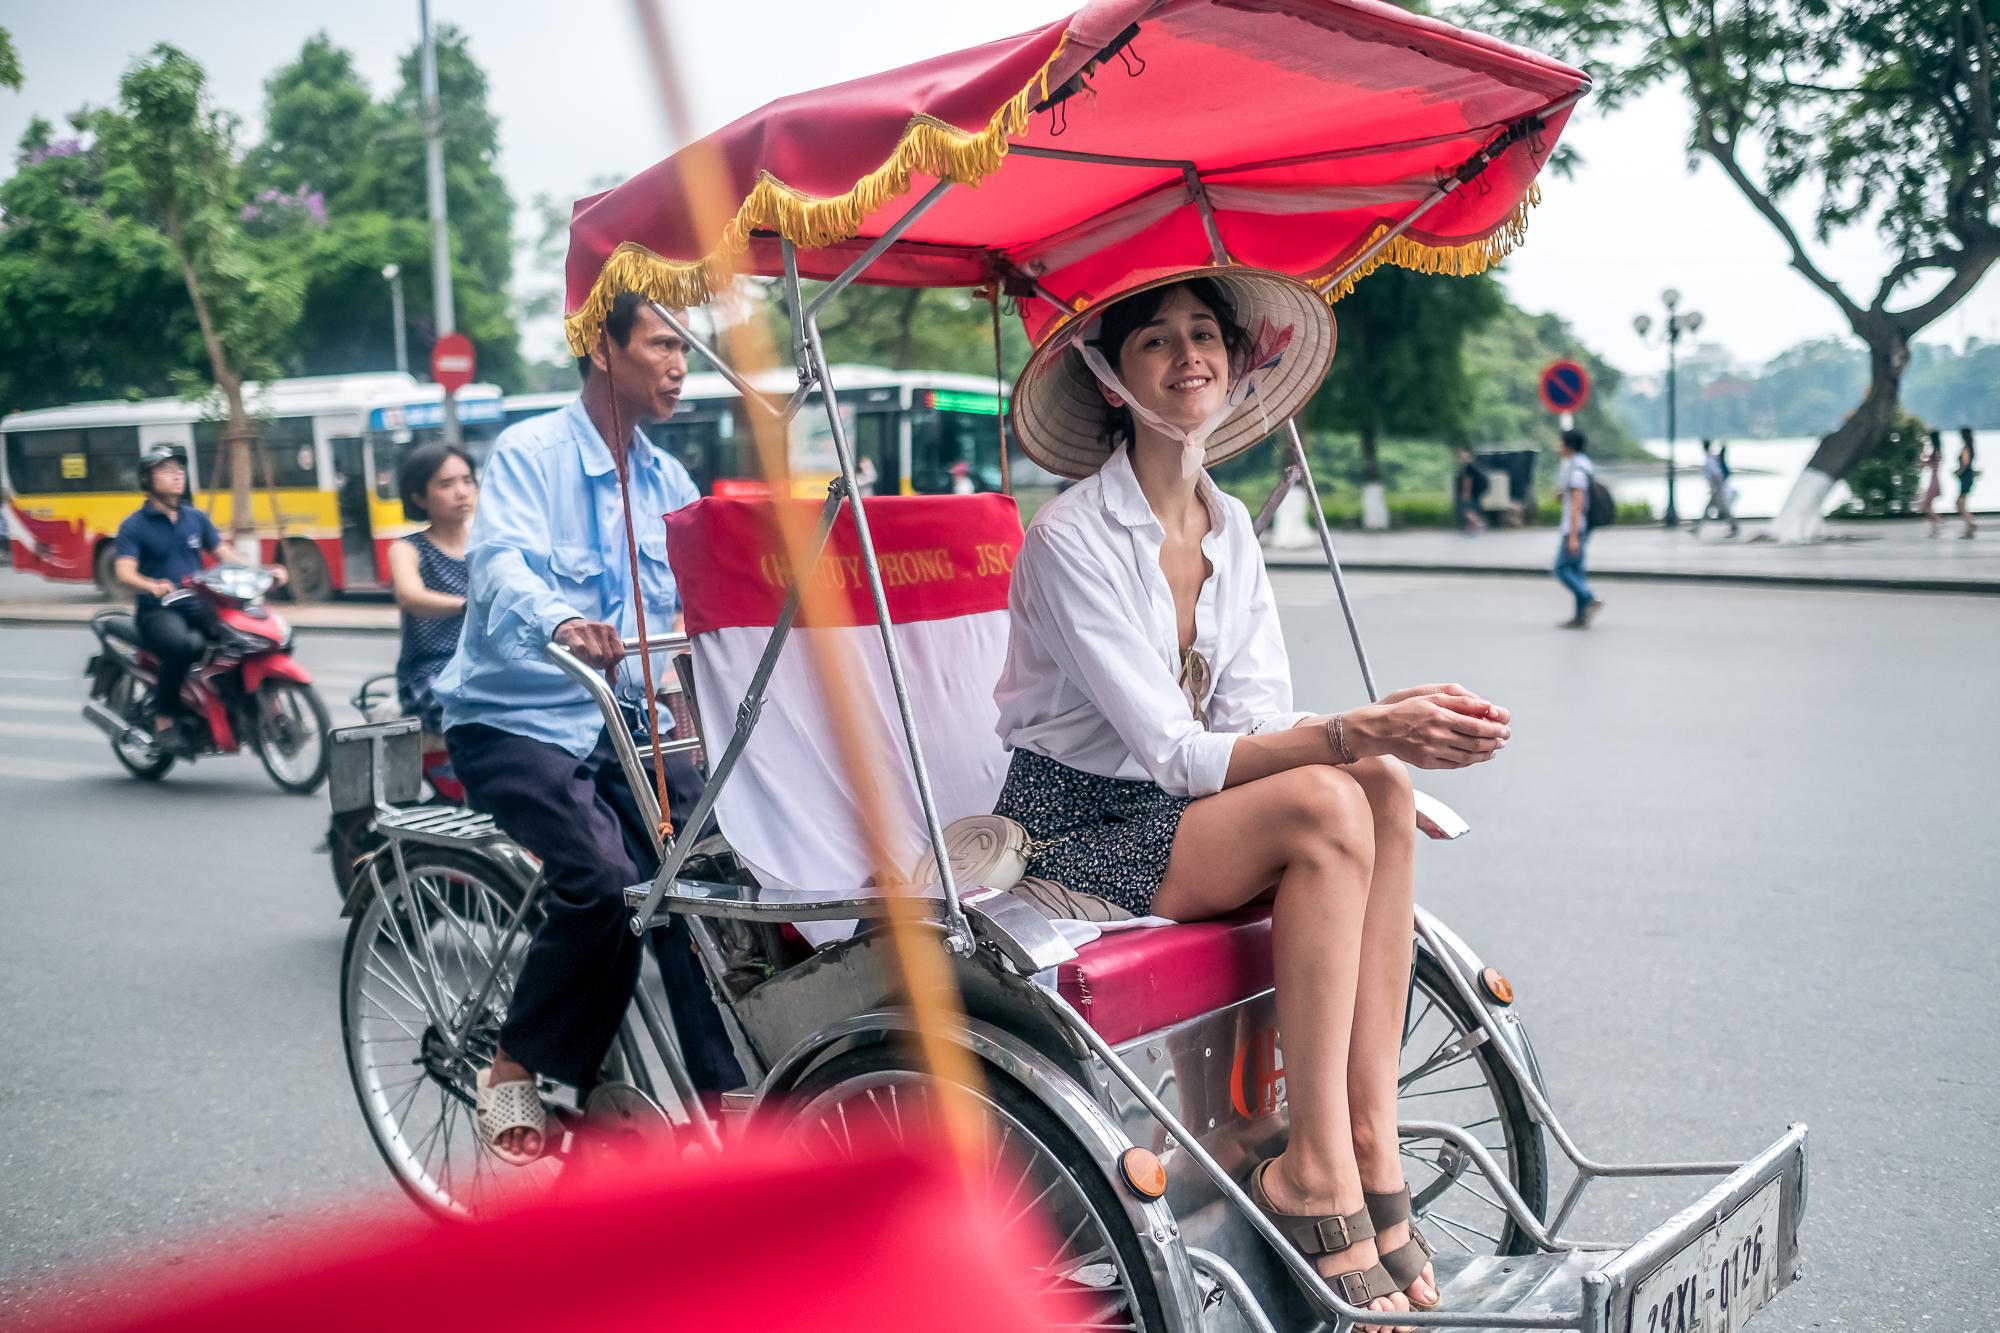 Vietnam_Honeymoon_TheOutsiderBlog_DSCF8044.JPG